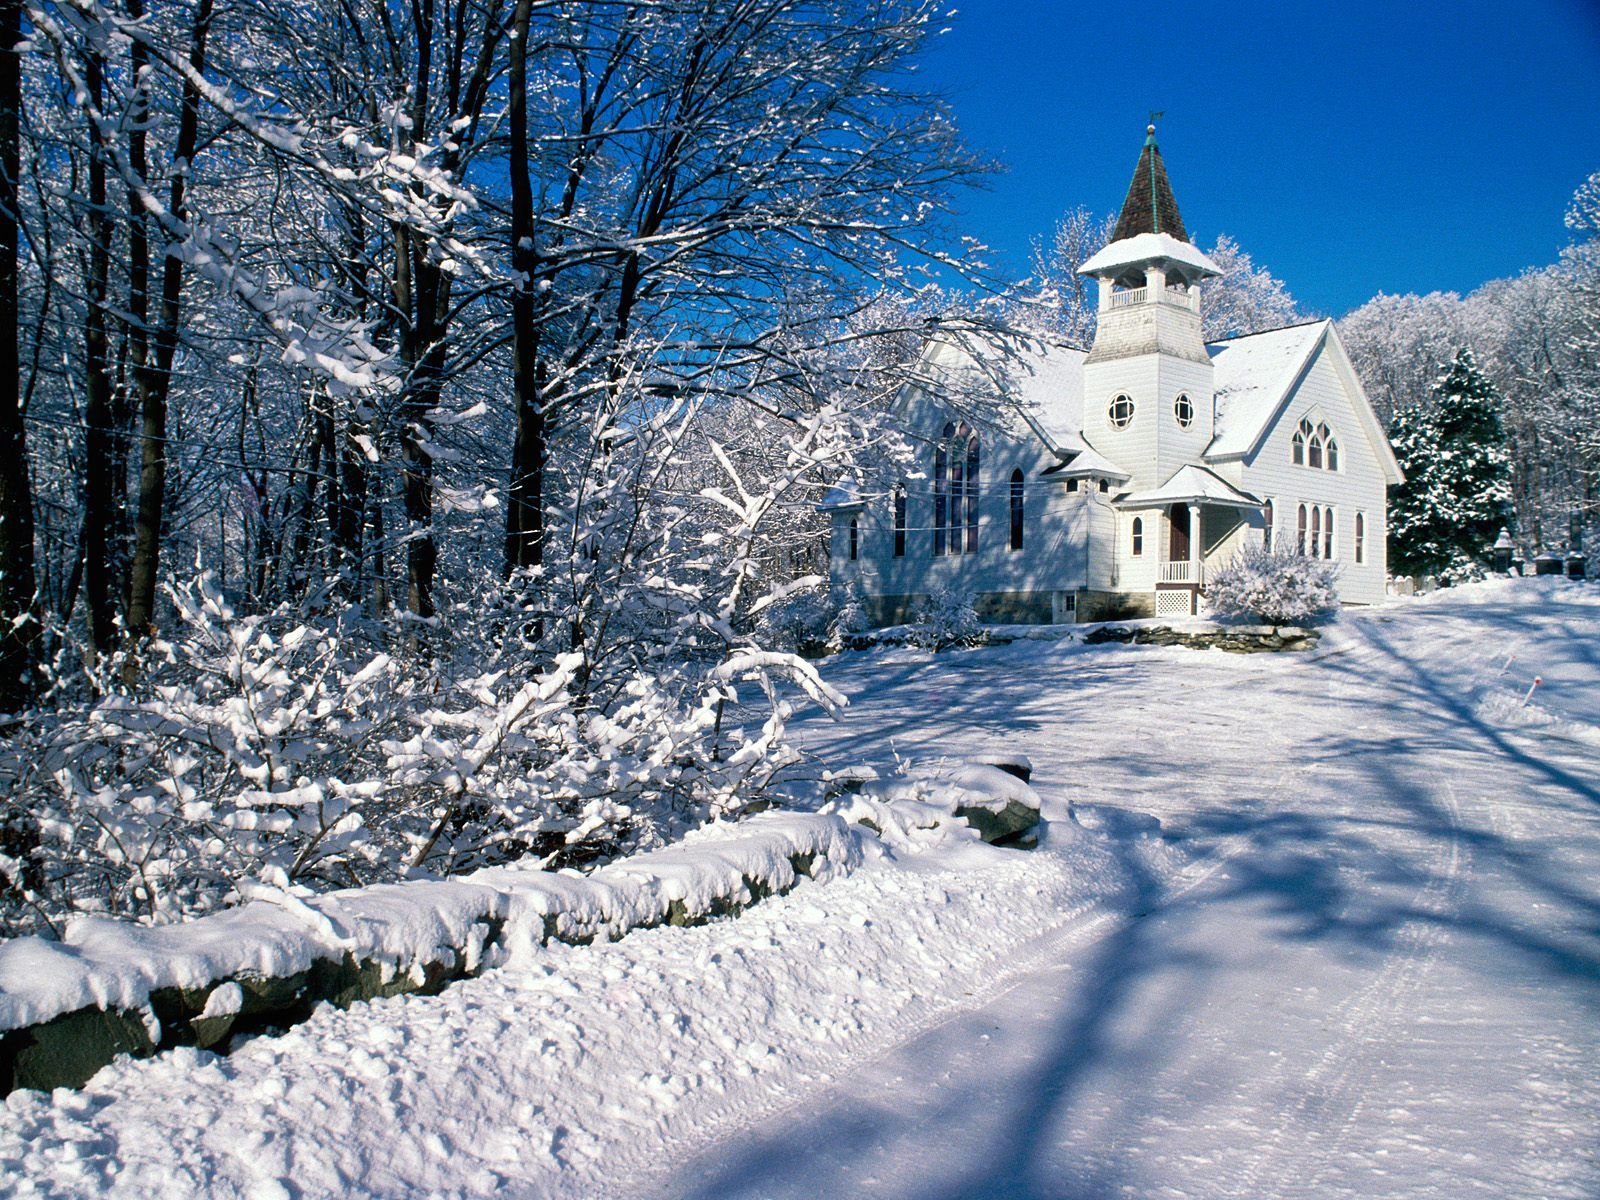 Snow In PutnamCounty New York